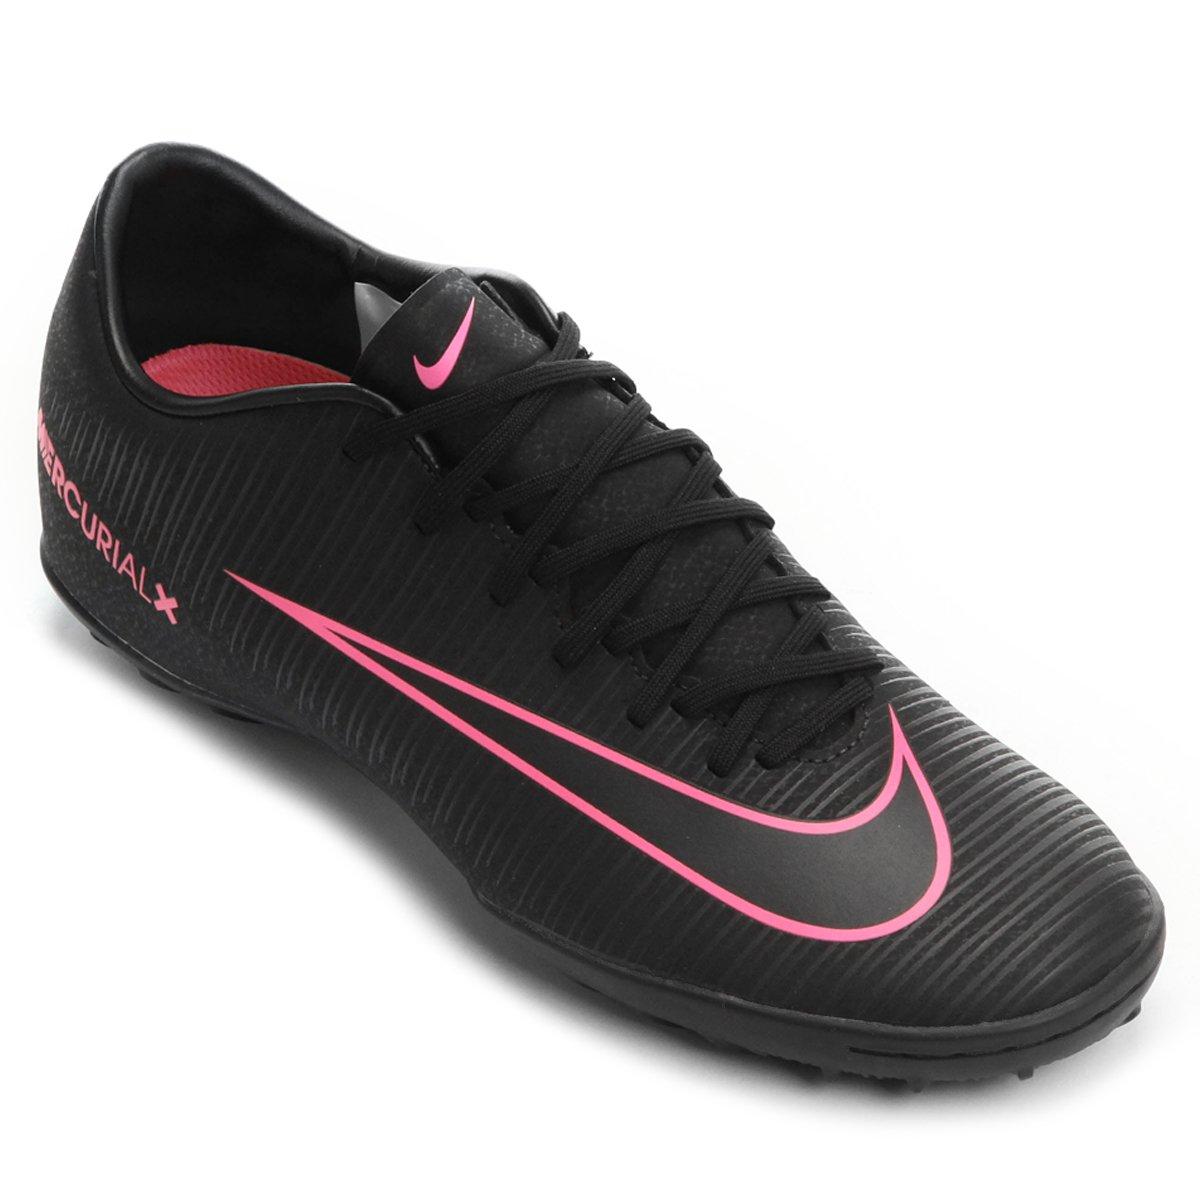 186d33fbf3 Chuteira Society Nike Mercurial Victory 6 TF - Compre Agora